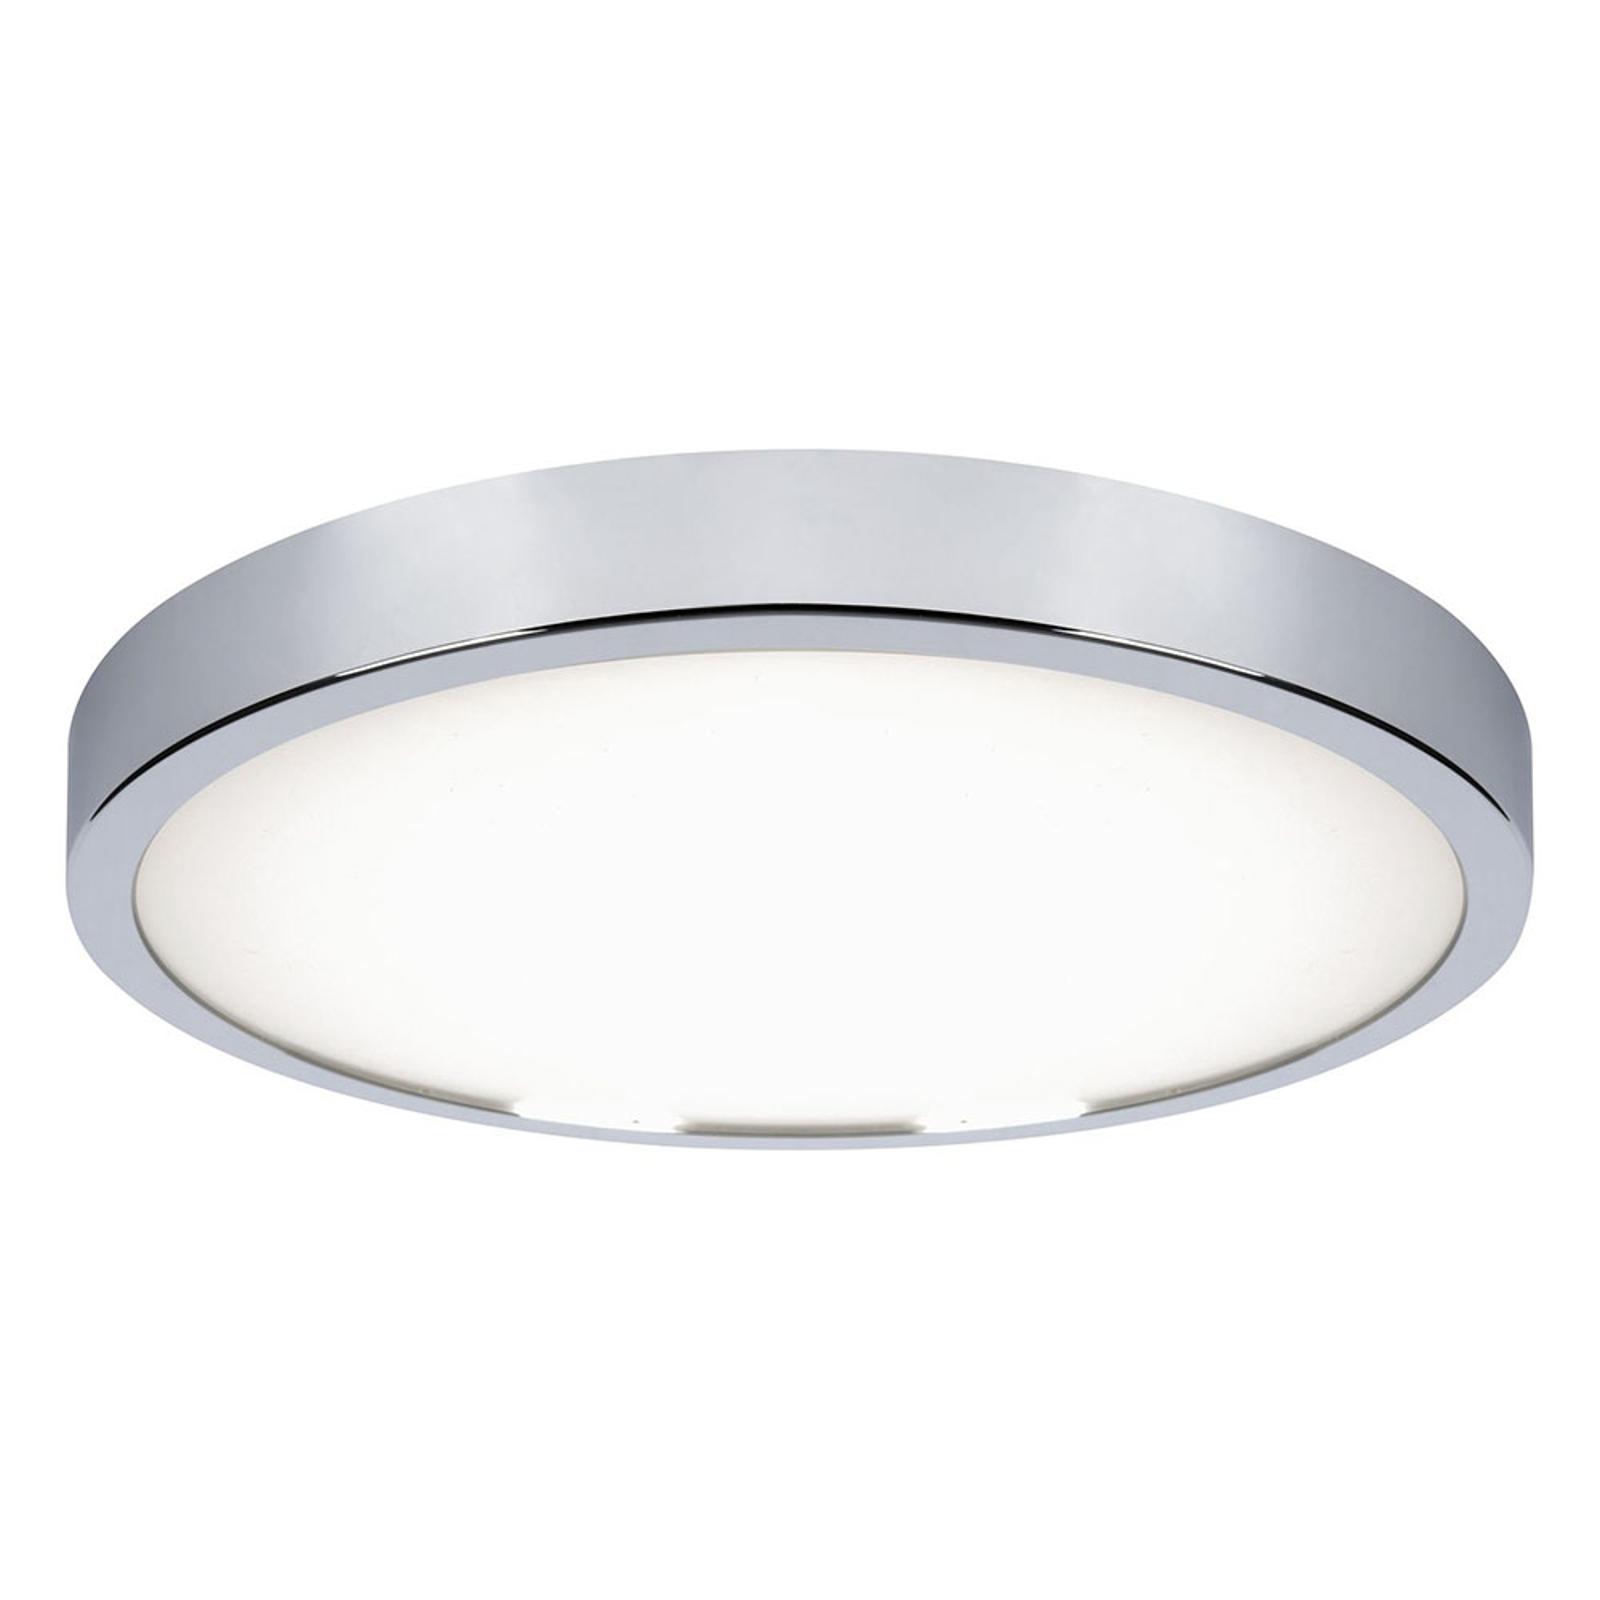 Paulmann Aviar LED-Deckenlampe WhiteSwitch Ø 36cm